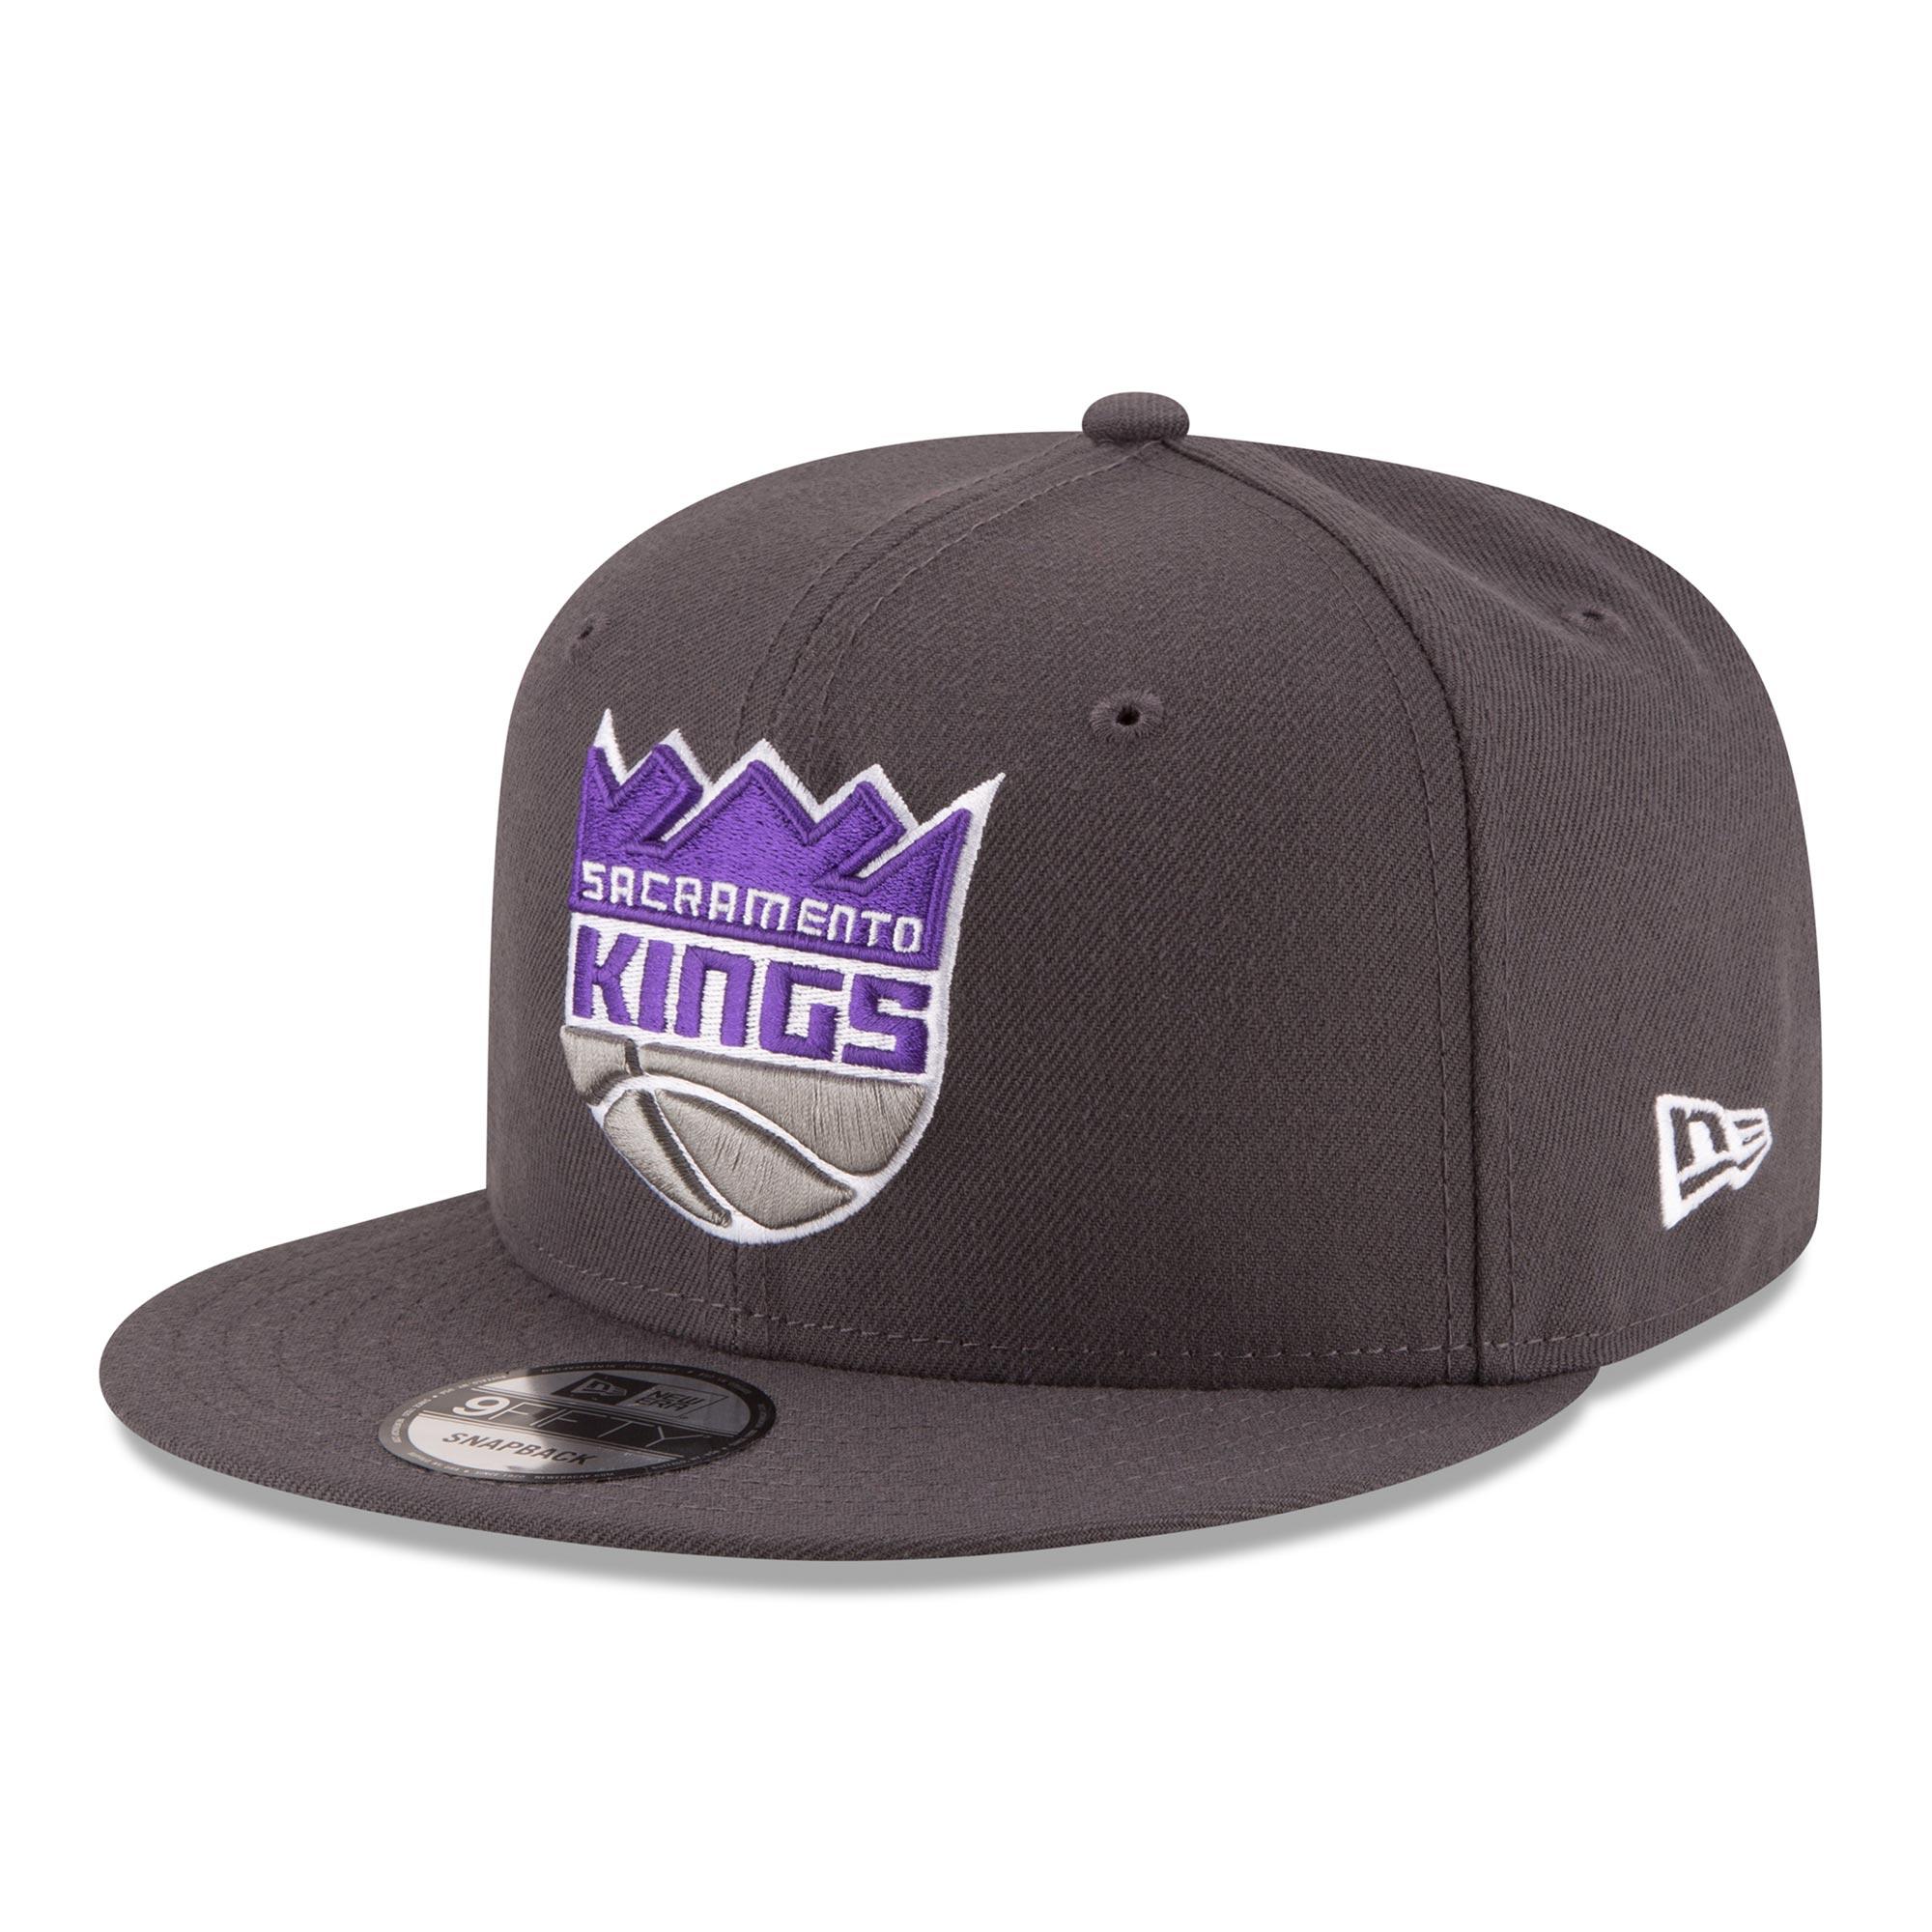 Gorra 9FIFTY de los Sacramento Kings de New Era con cierre a presión